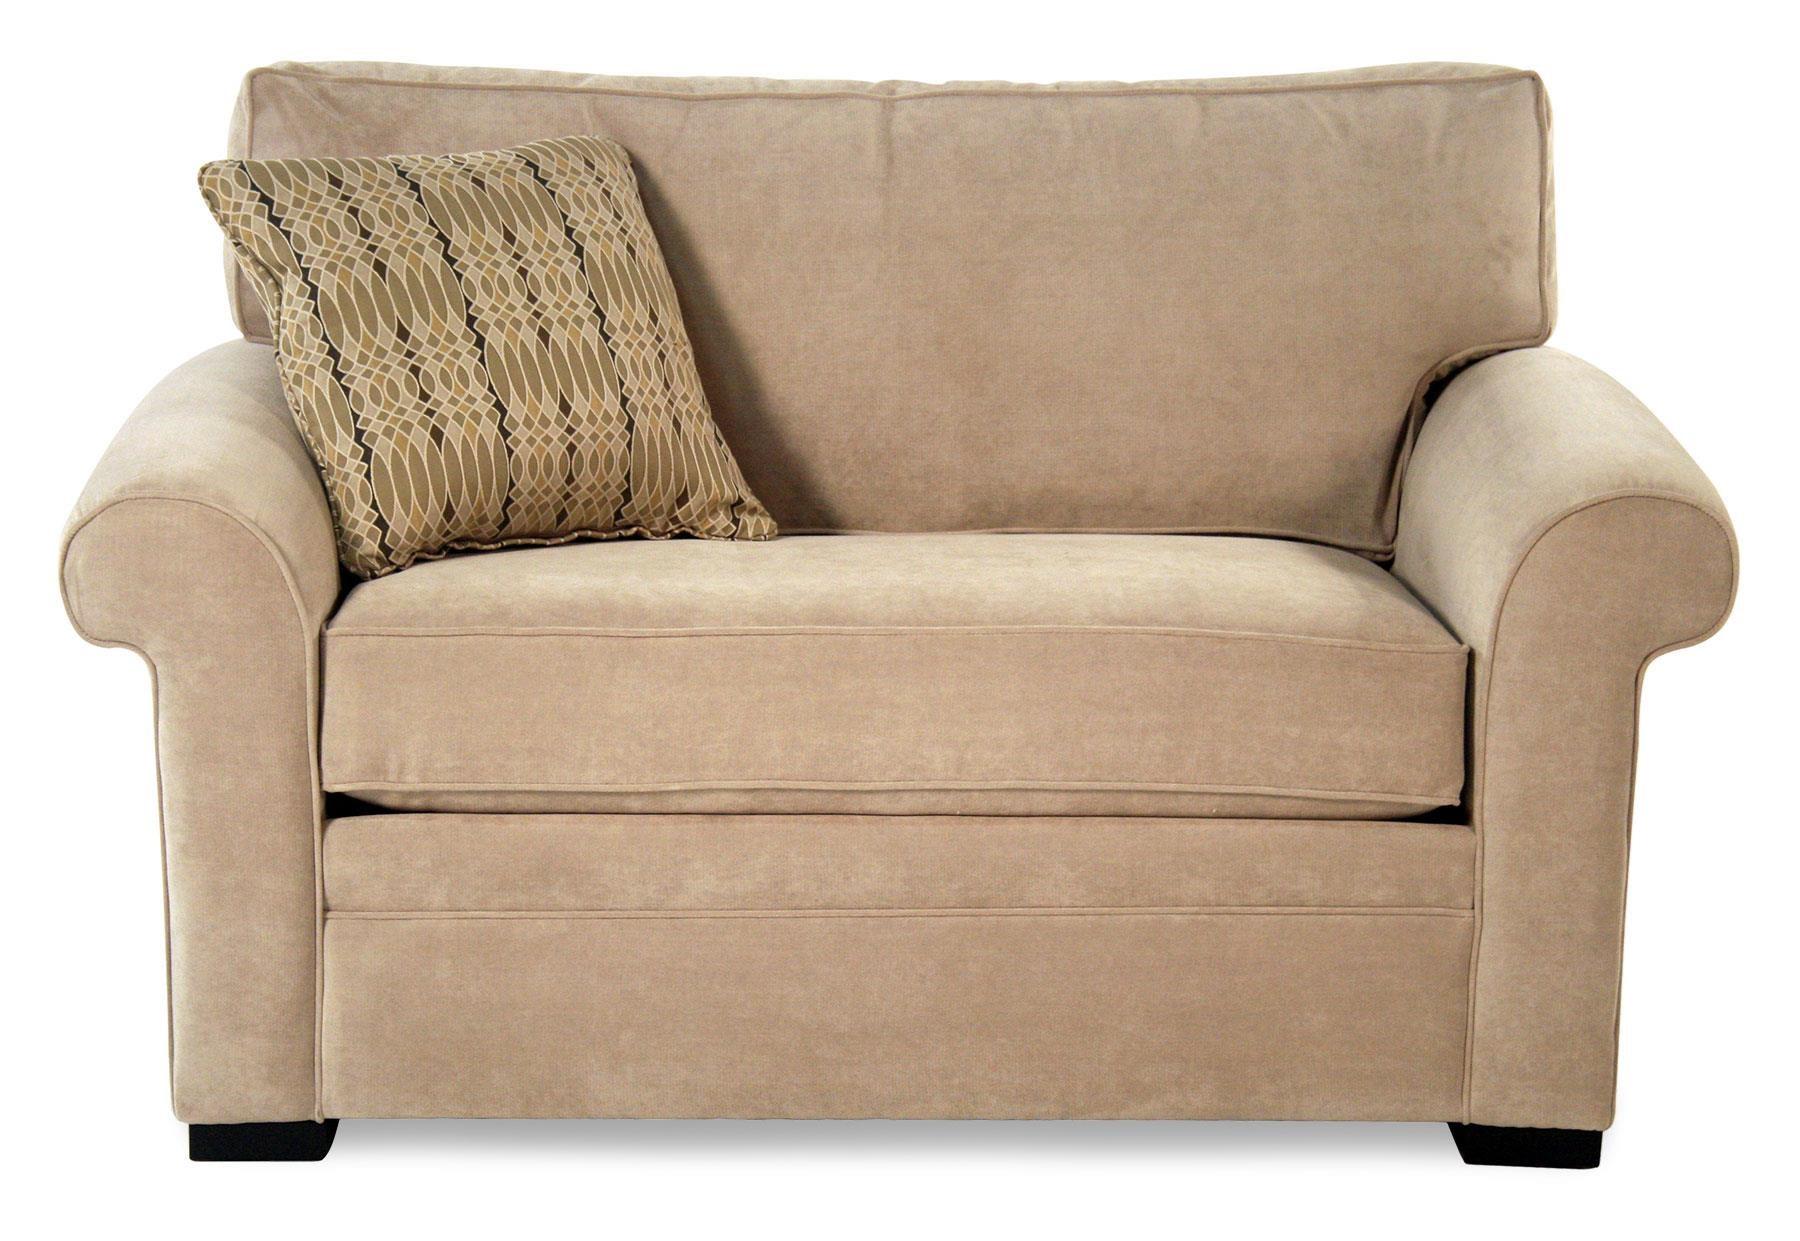 Cisco Caprice Chair Bed - Item Number: 107-85SP